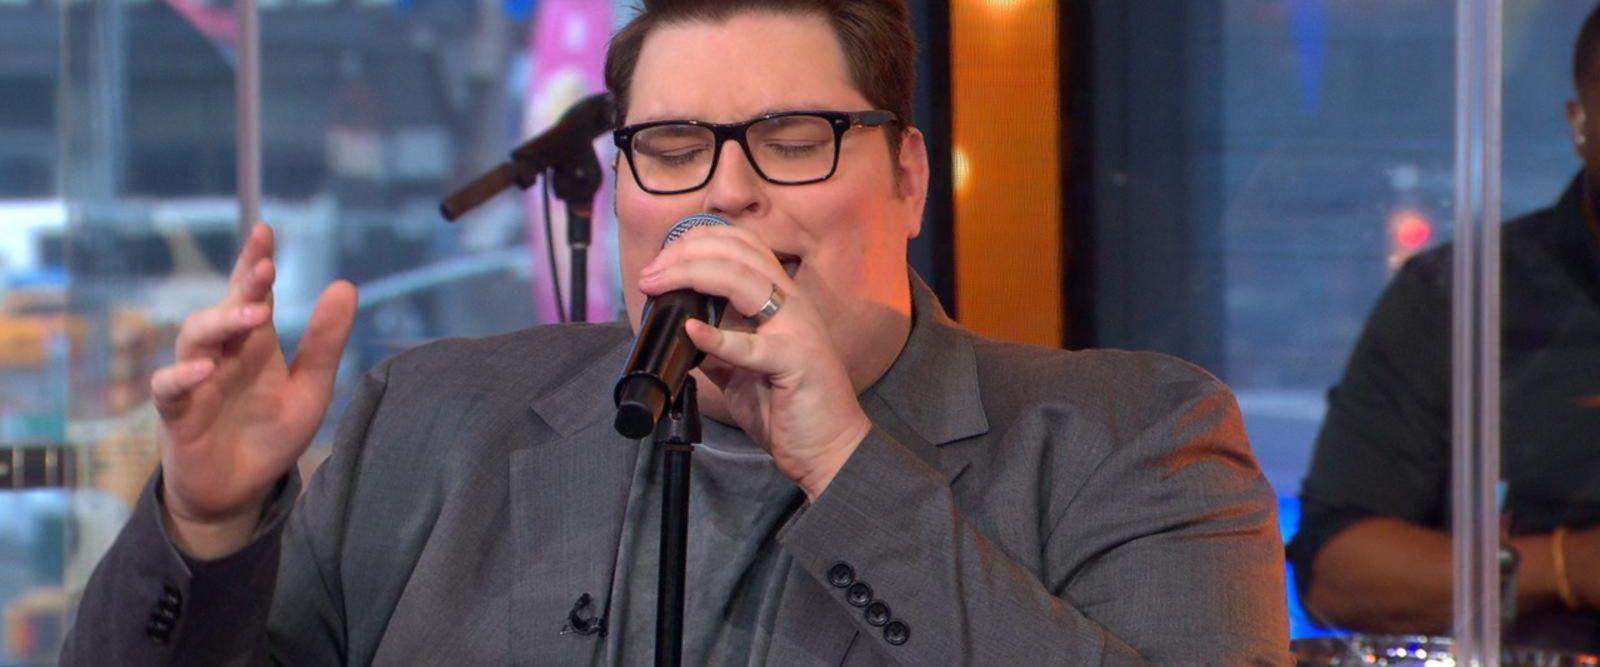 VIDEO: Jordan Smith performs 'Feel Good' live